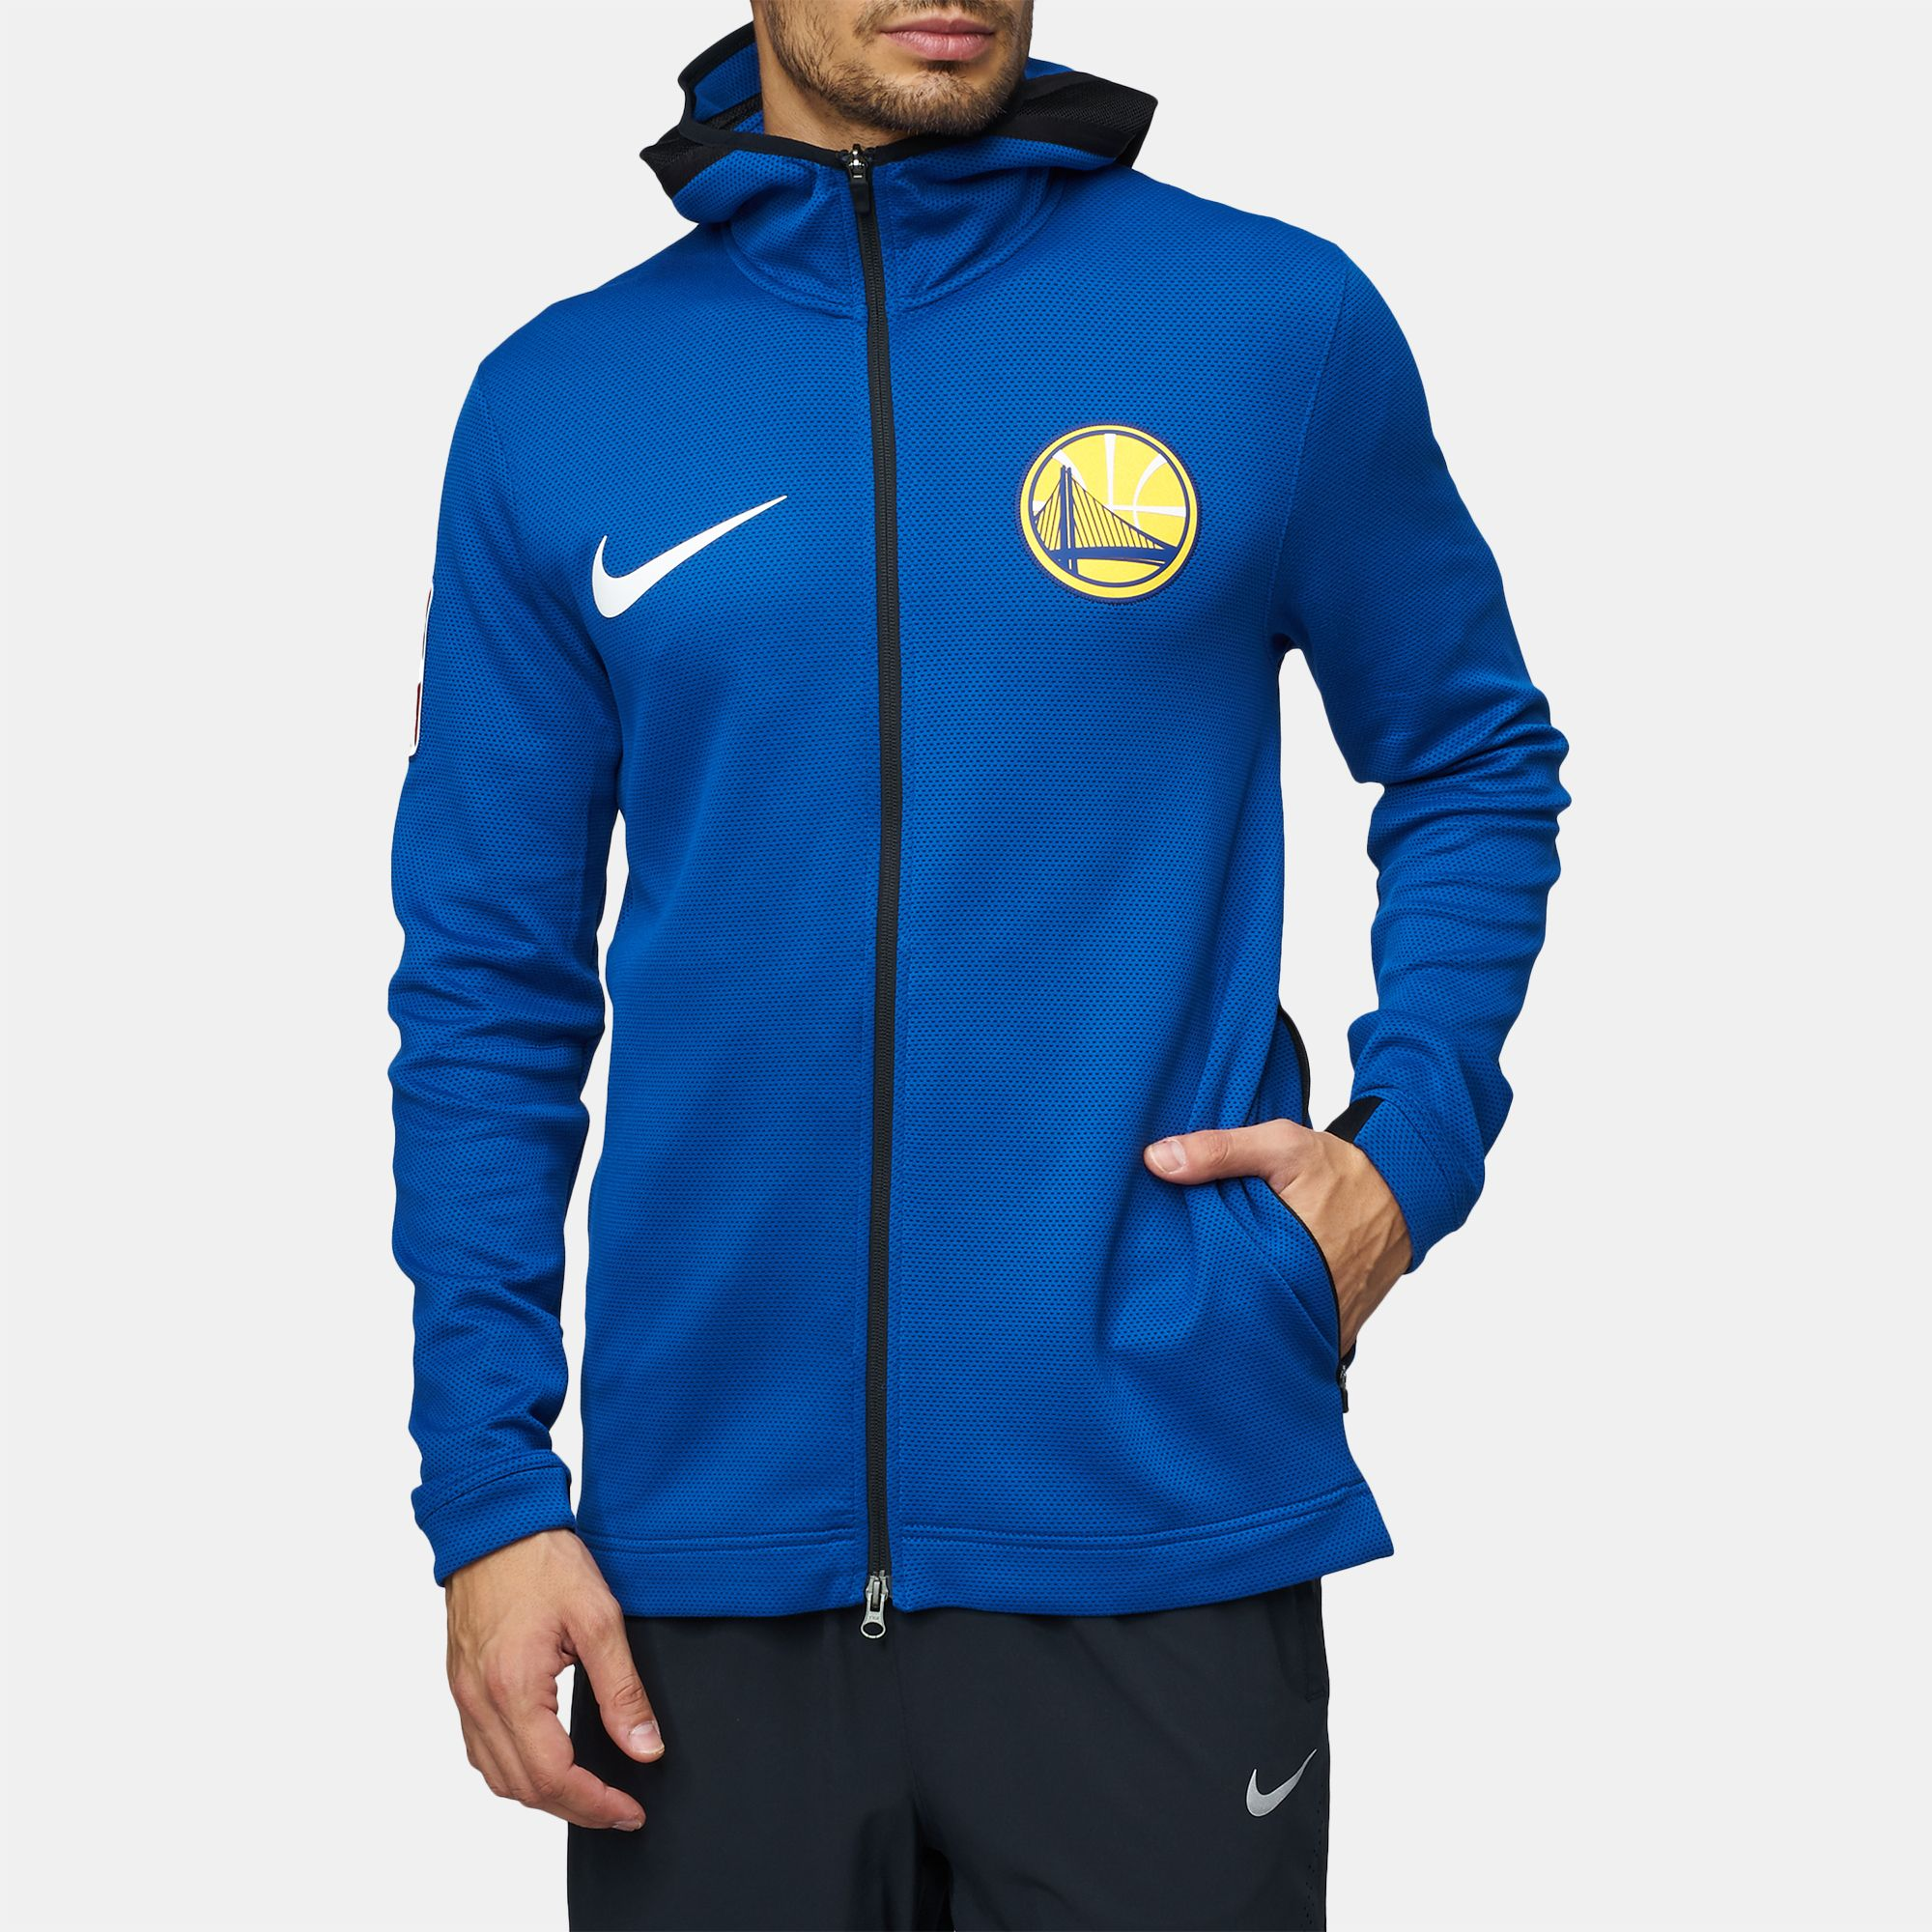 0837294d529 Shop Blue Nike NBA Golden State Warriors Therma Flex Showtime Full ...